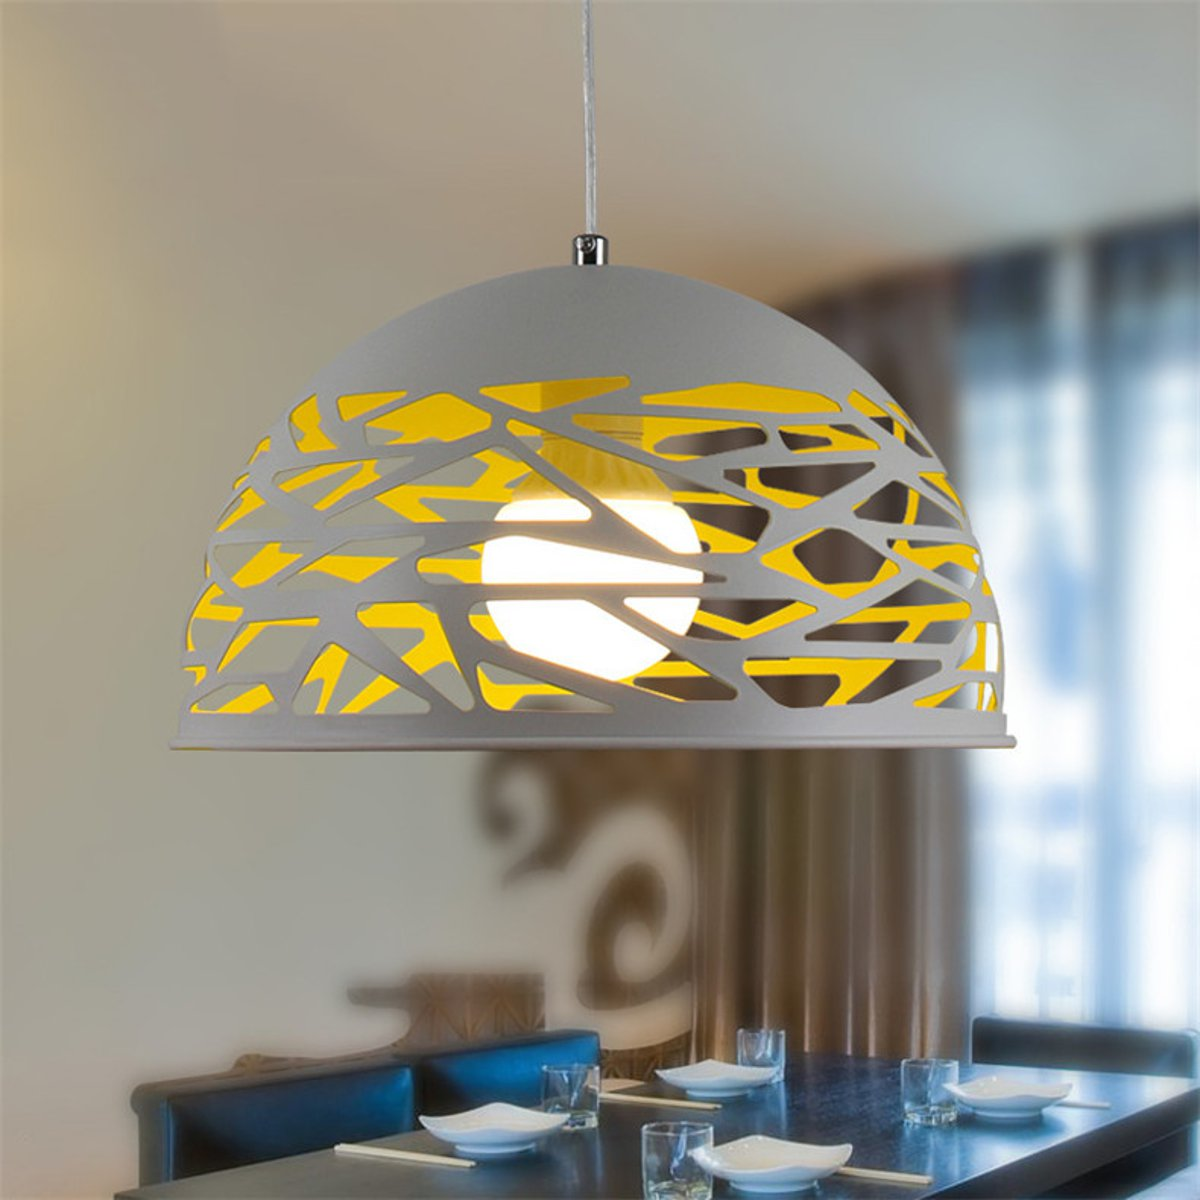 Retro-Lampe-de-Plafond-Suspension-Lustre-Pendante-Plafonnier-Luminaire-Eclairage